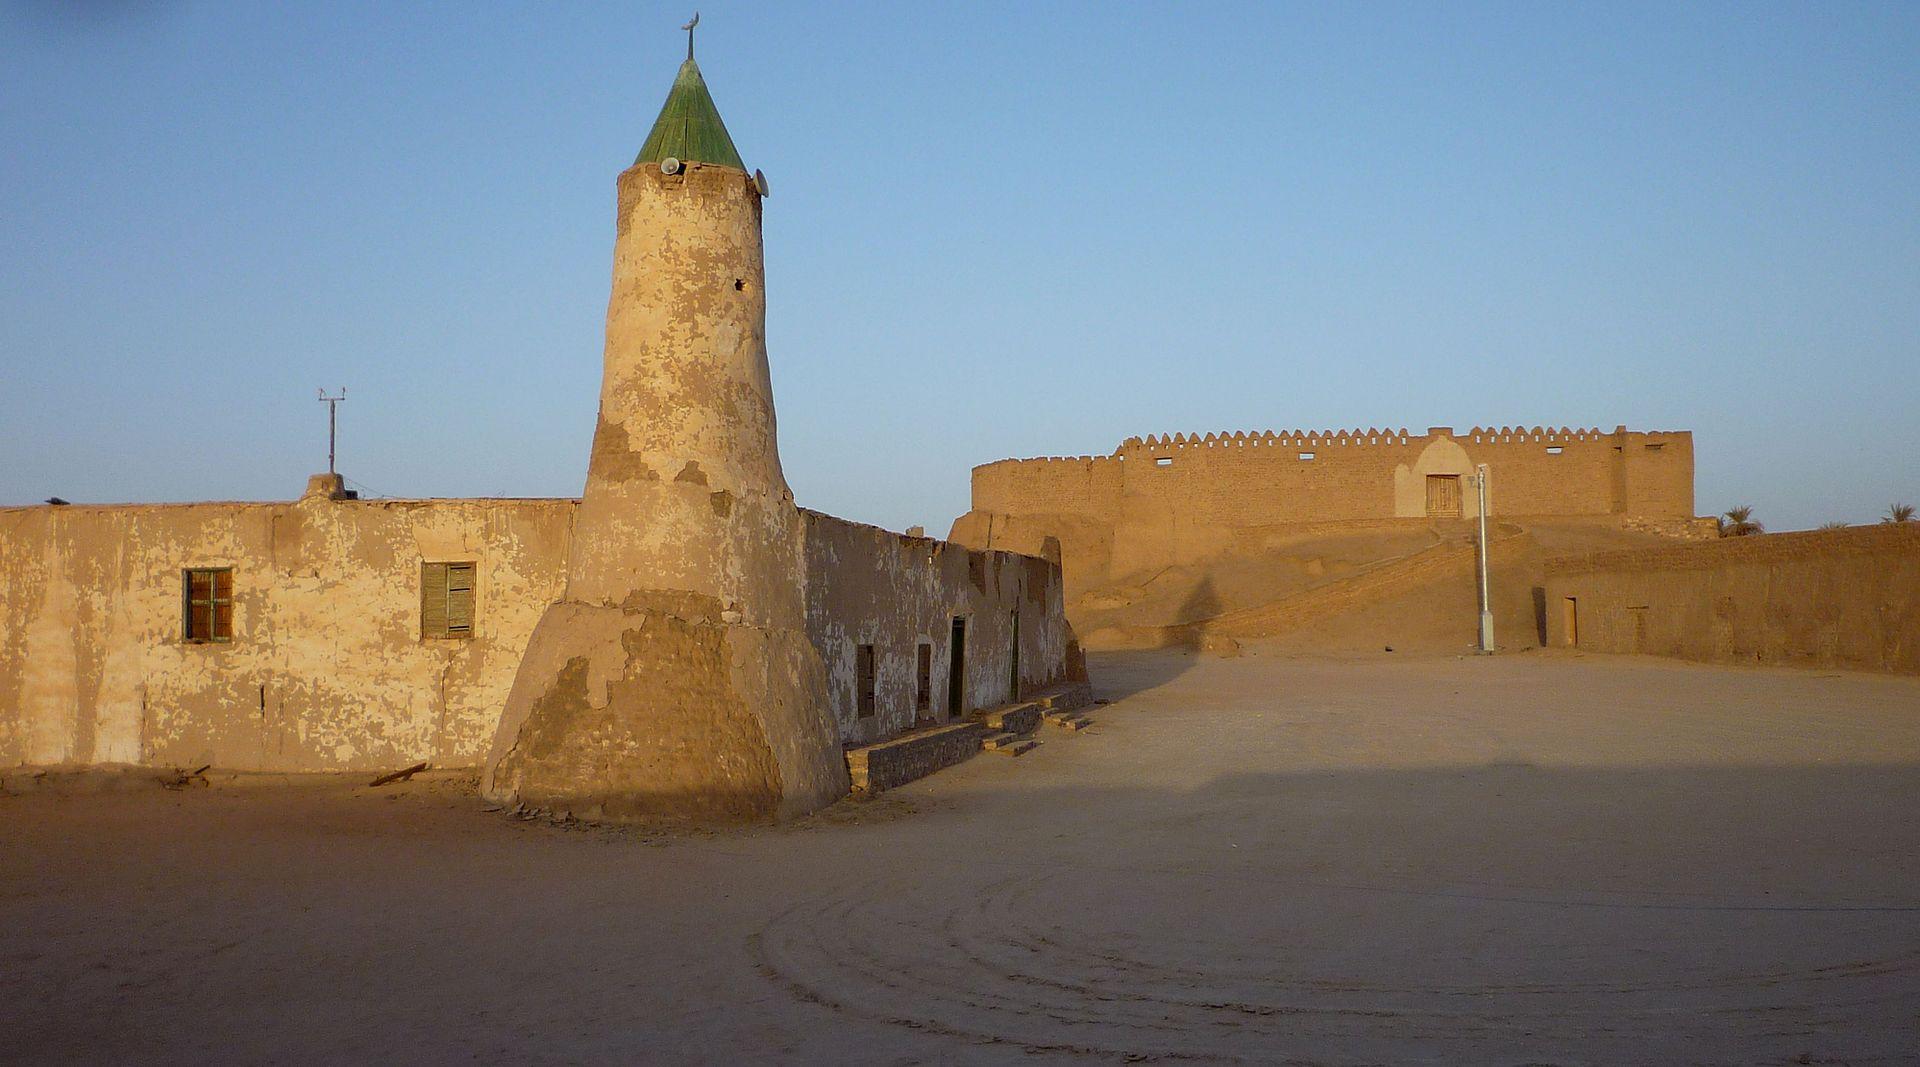 Murzuq_ливия 16 в -_Festung_Qala_at_Turk,_Moschee.jpg